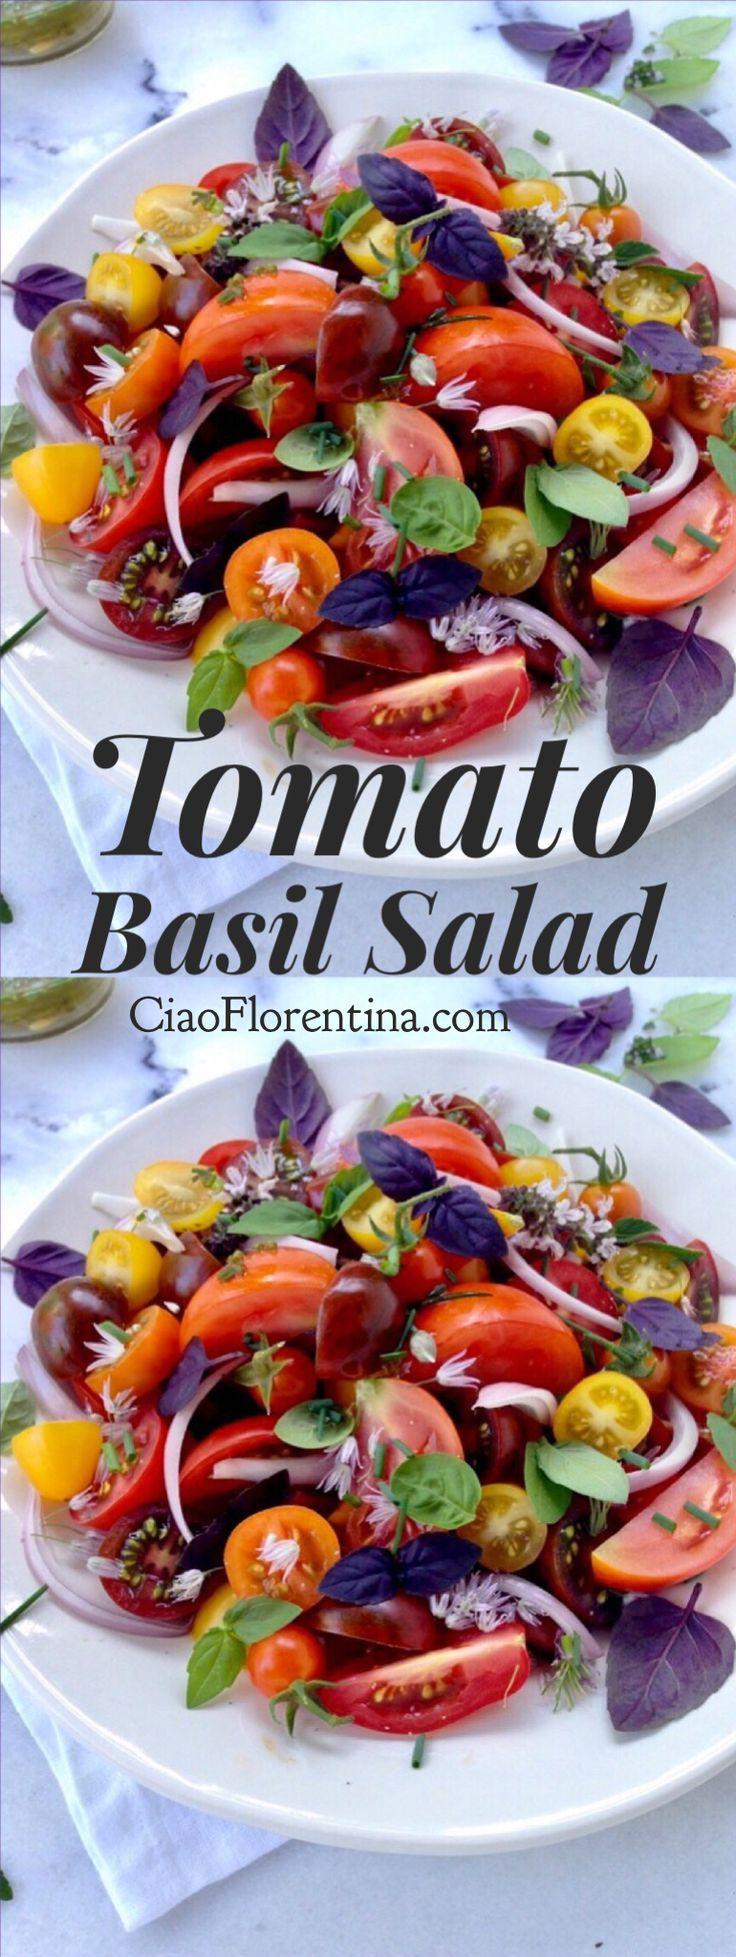 Tomato Basil Salad with a Chive Vinaigrette 🍅 🌿 |CiaoFlorentina.com @CiaoFlorentina